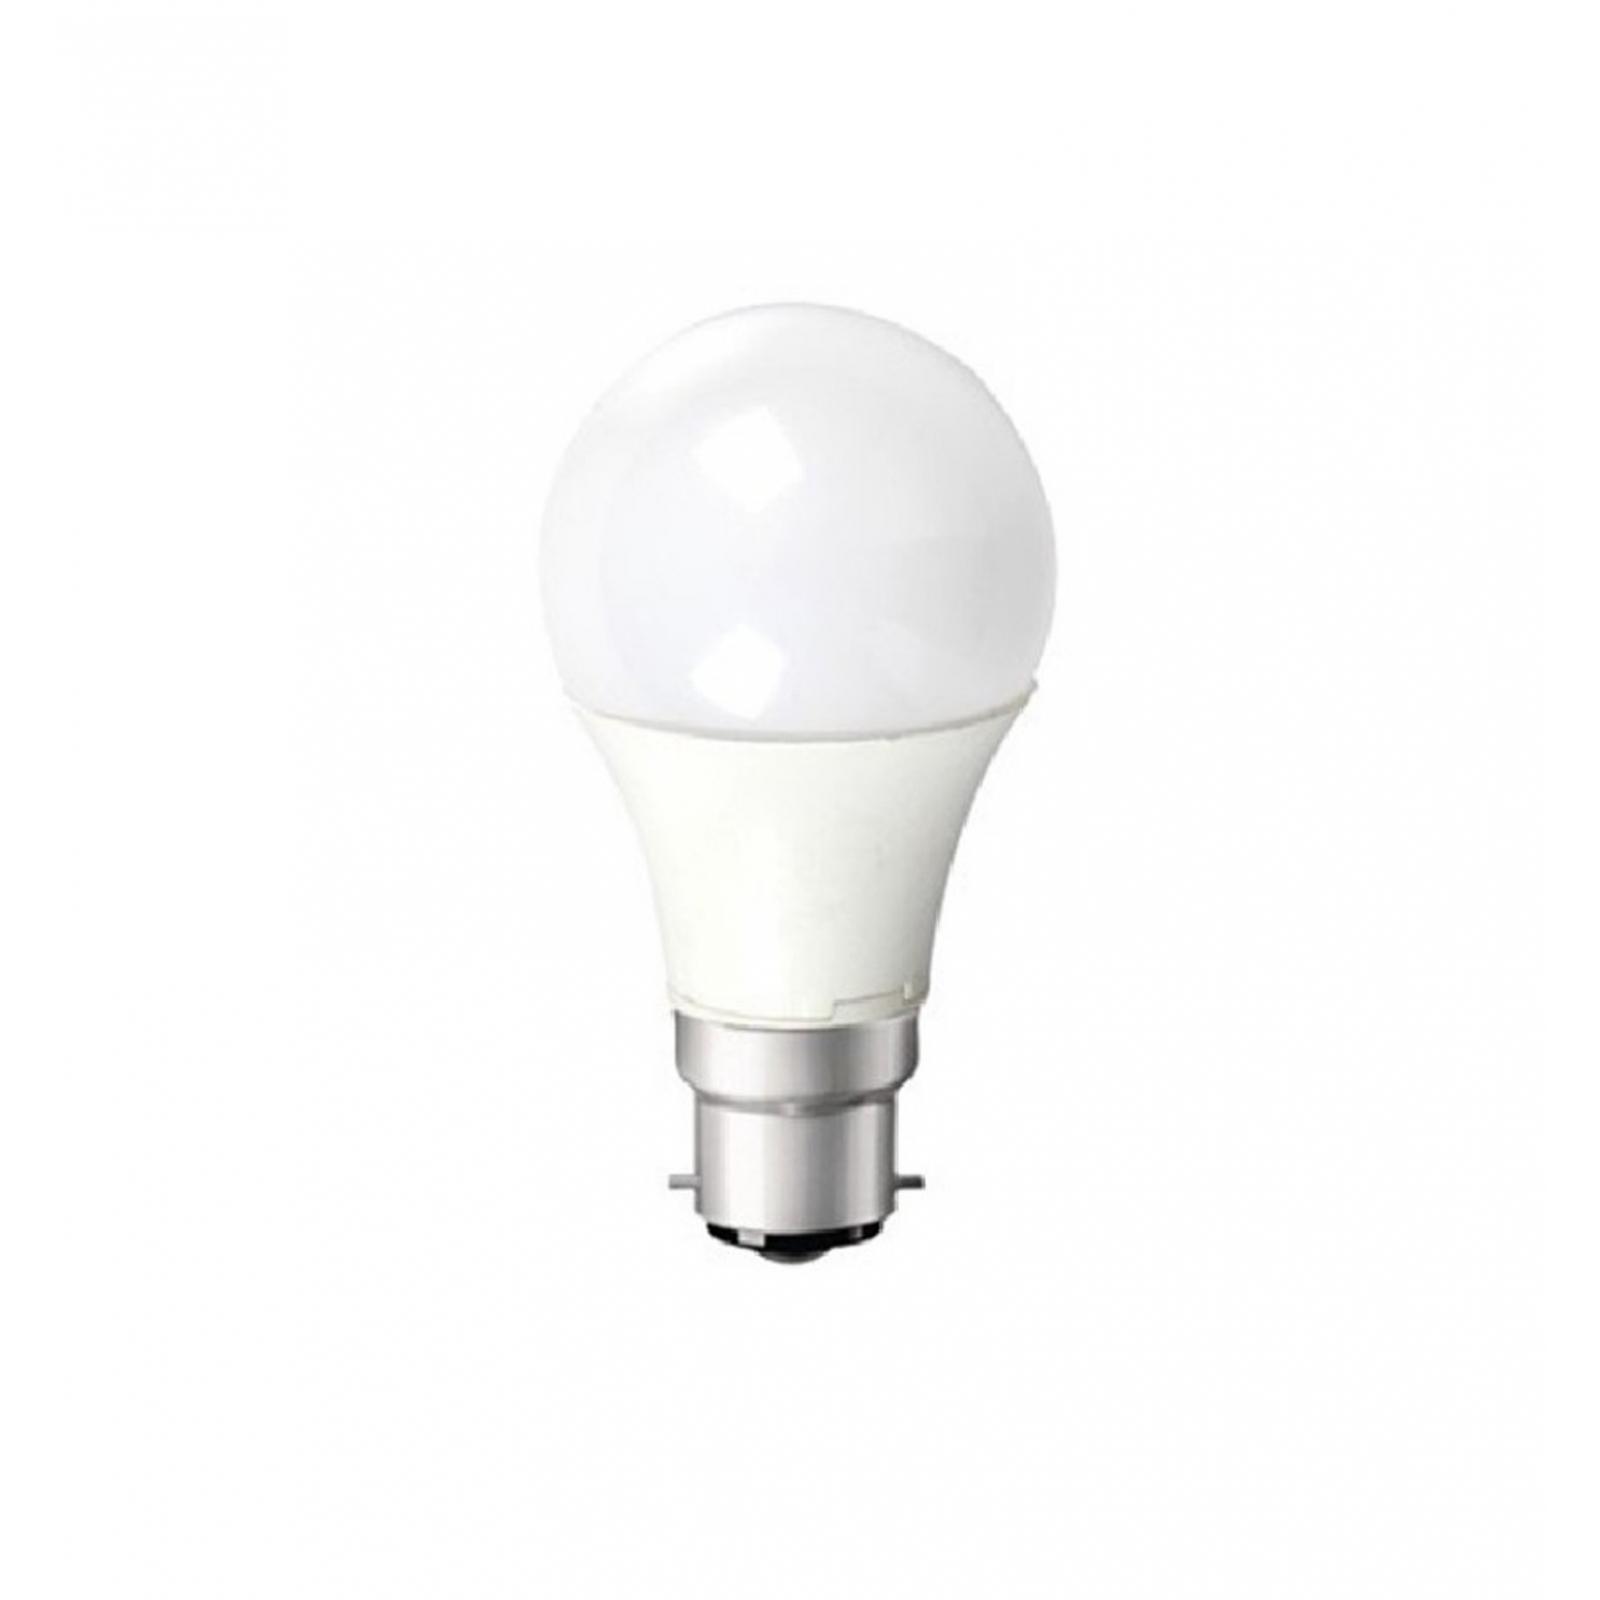 Ampoule LED B22 12W Blanc Froid 6000K